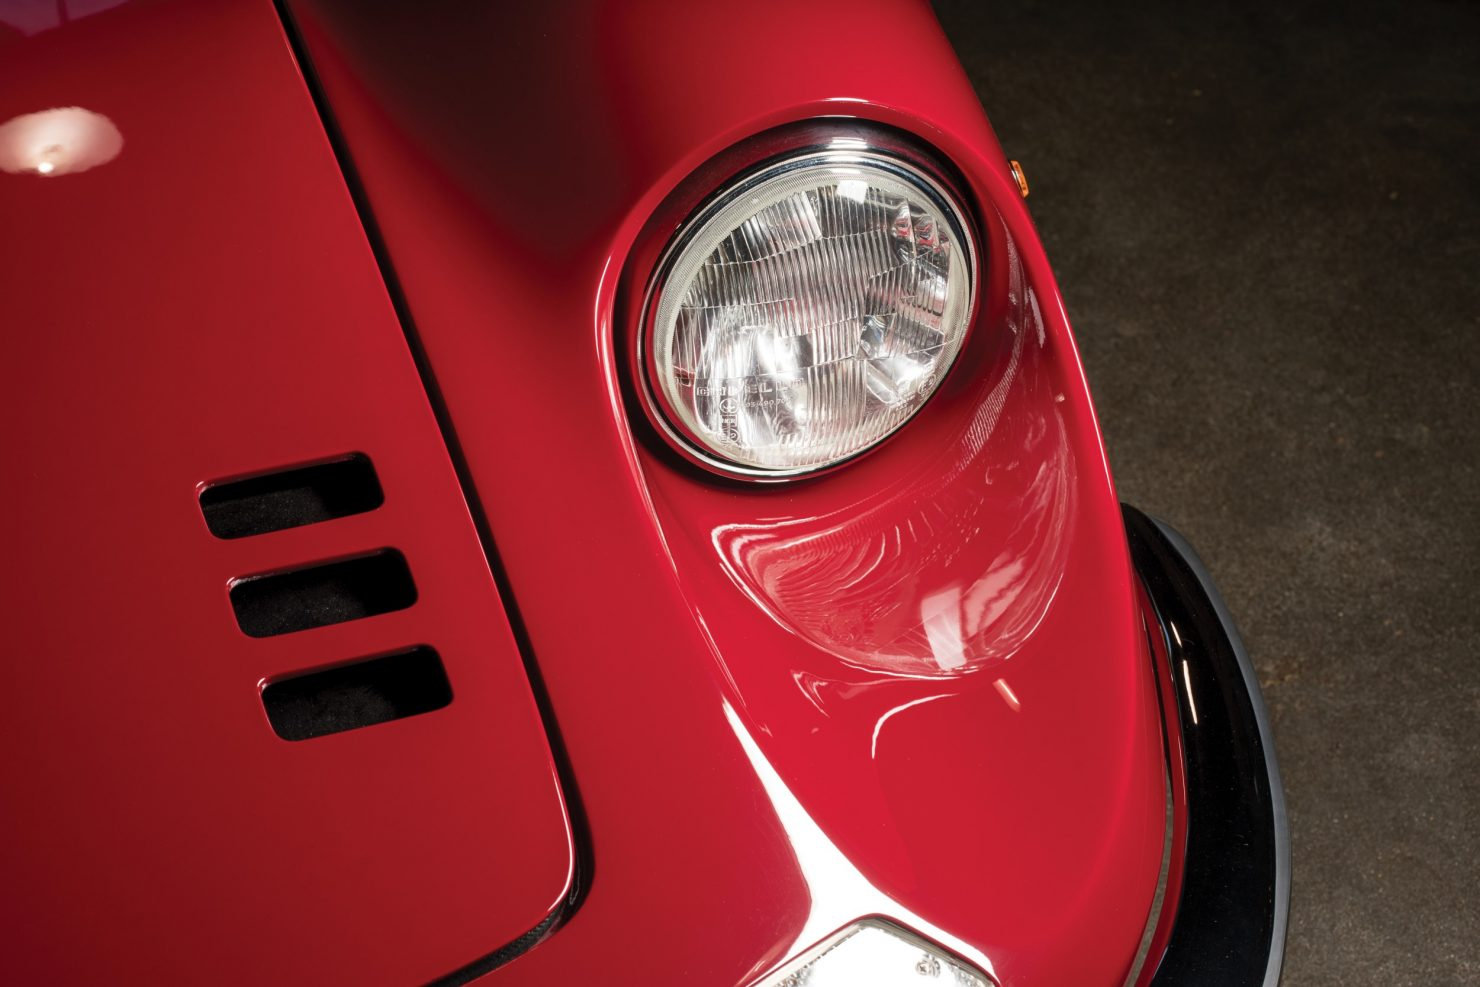 ferrari dino 246 8 1480x987 - 1969 Ferrari Dino 246 GT